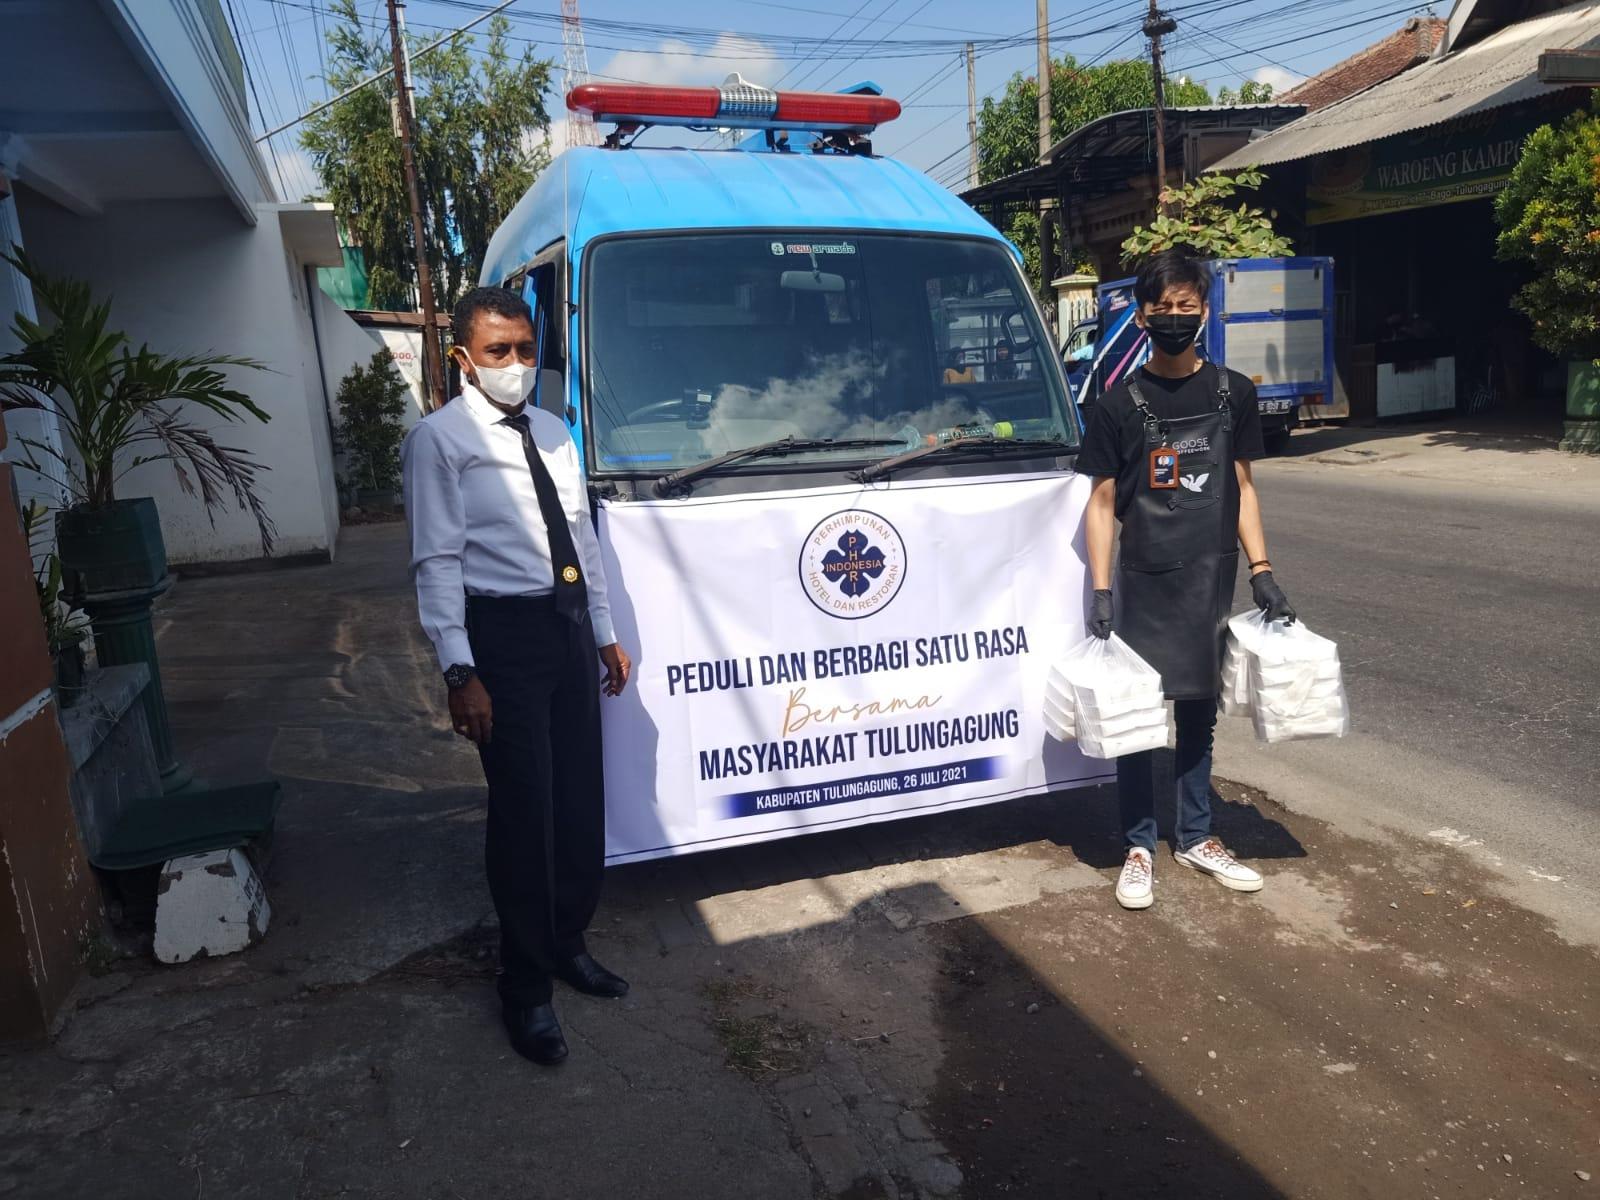 Polres Tulungagung Bersama PHRI, PMII dan Rekanan Gelar Baksos Peduli Satu Rasa Untuk Masyarakat Tul